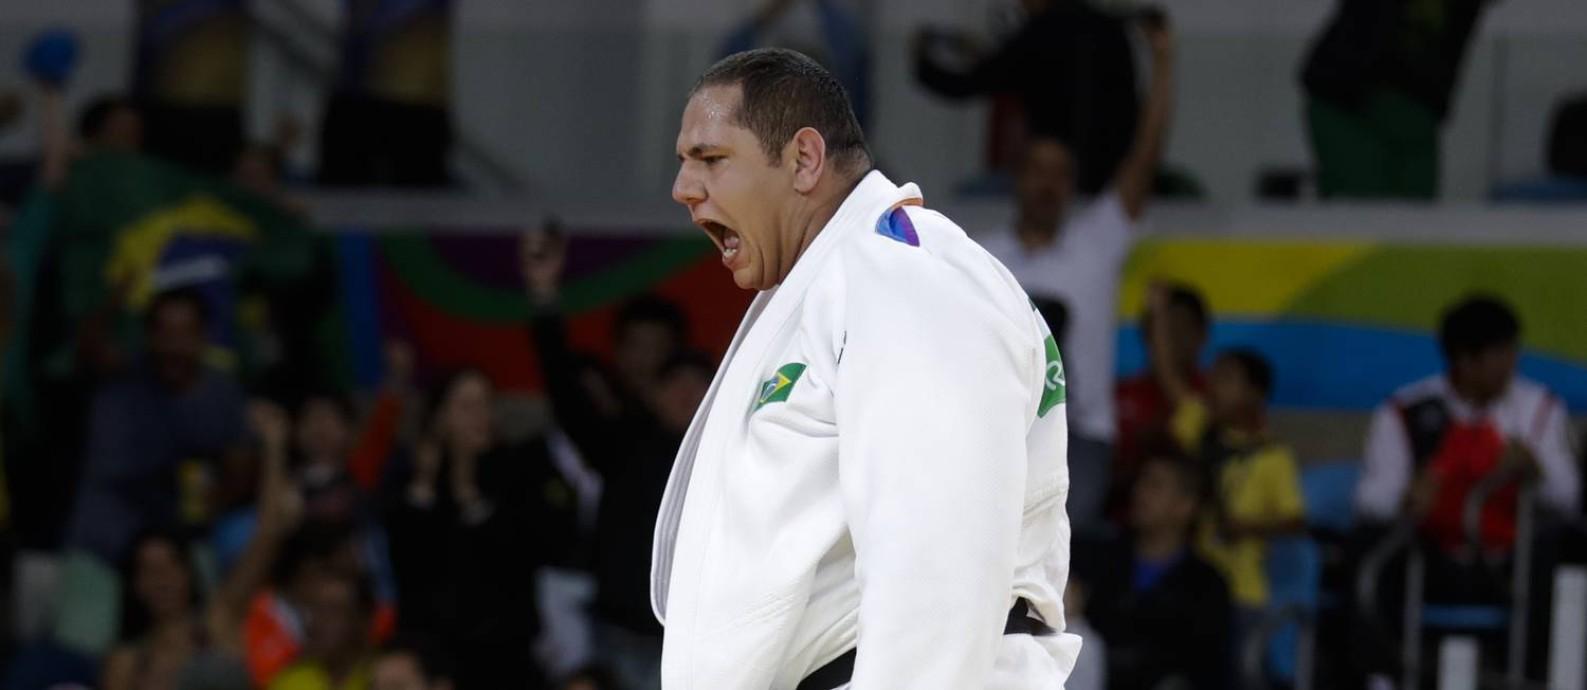 O judoca Rafael Silva, o Baby Foto: Markus Schreiber / AP